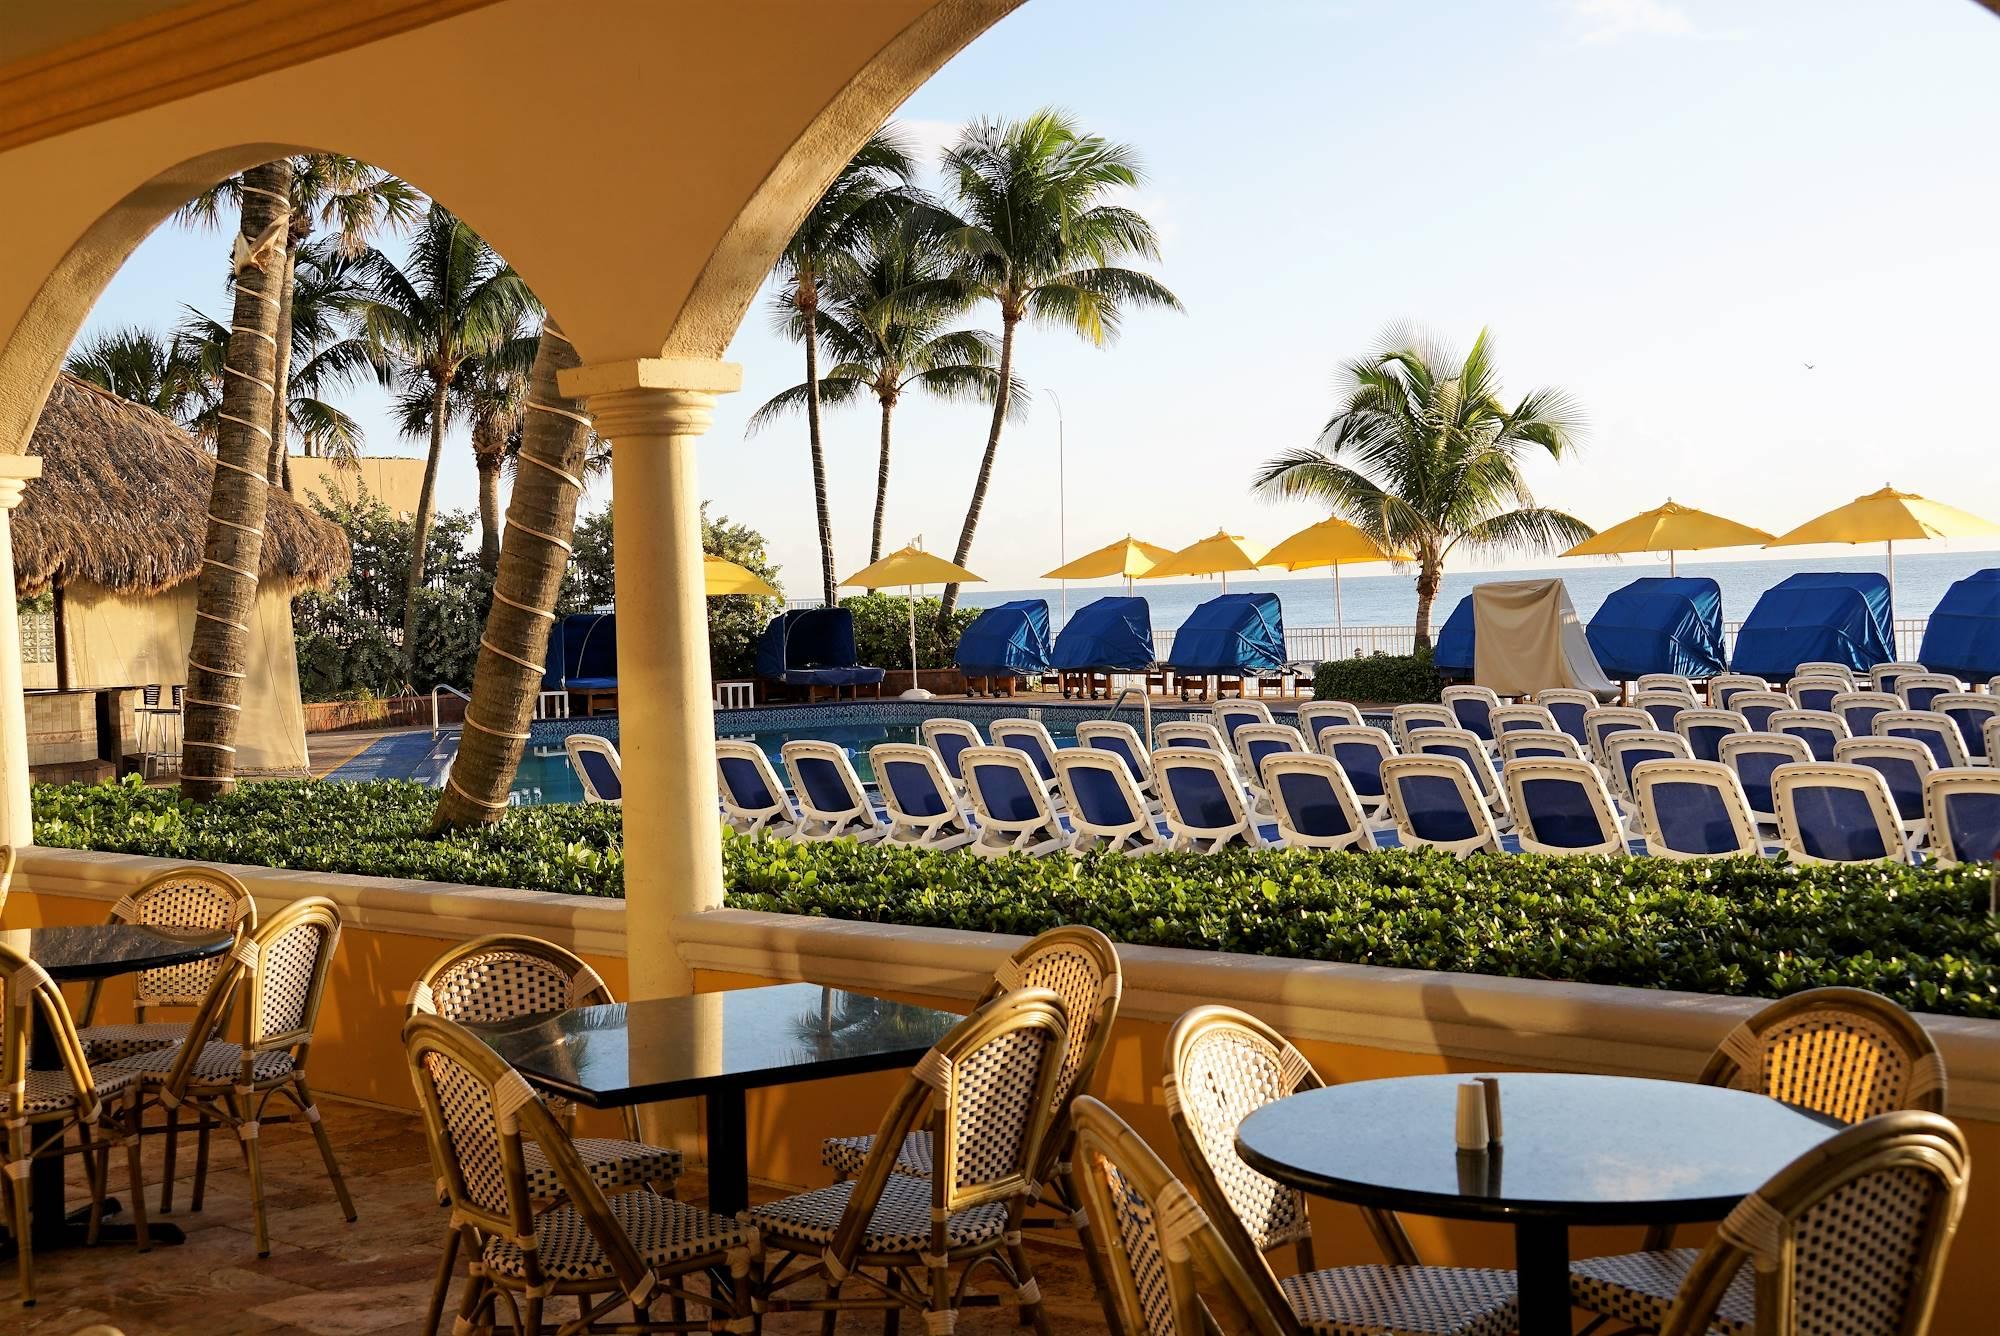 Ocean Sky Hotel- Outdoor Café Terrace